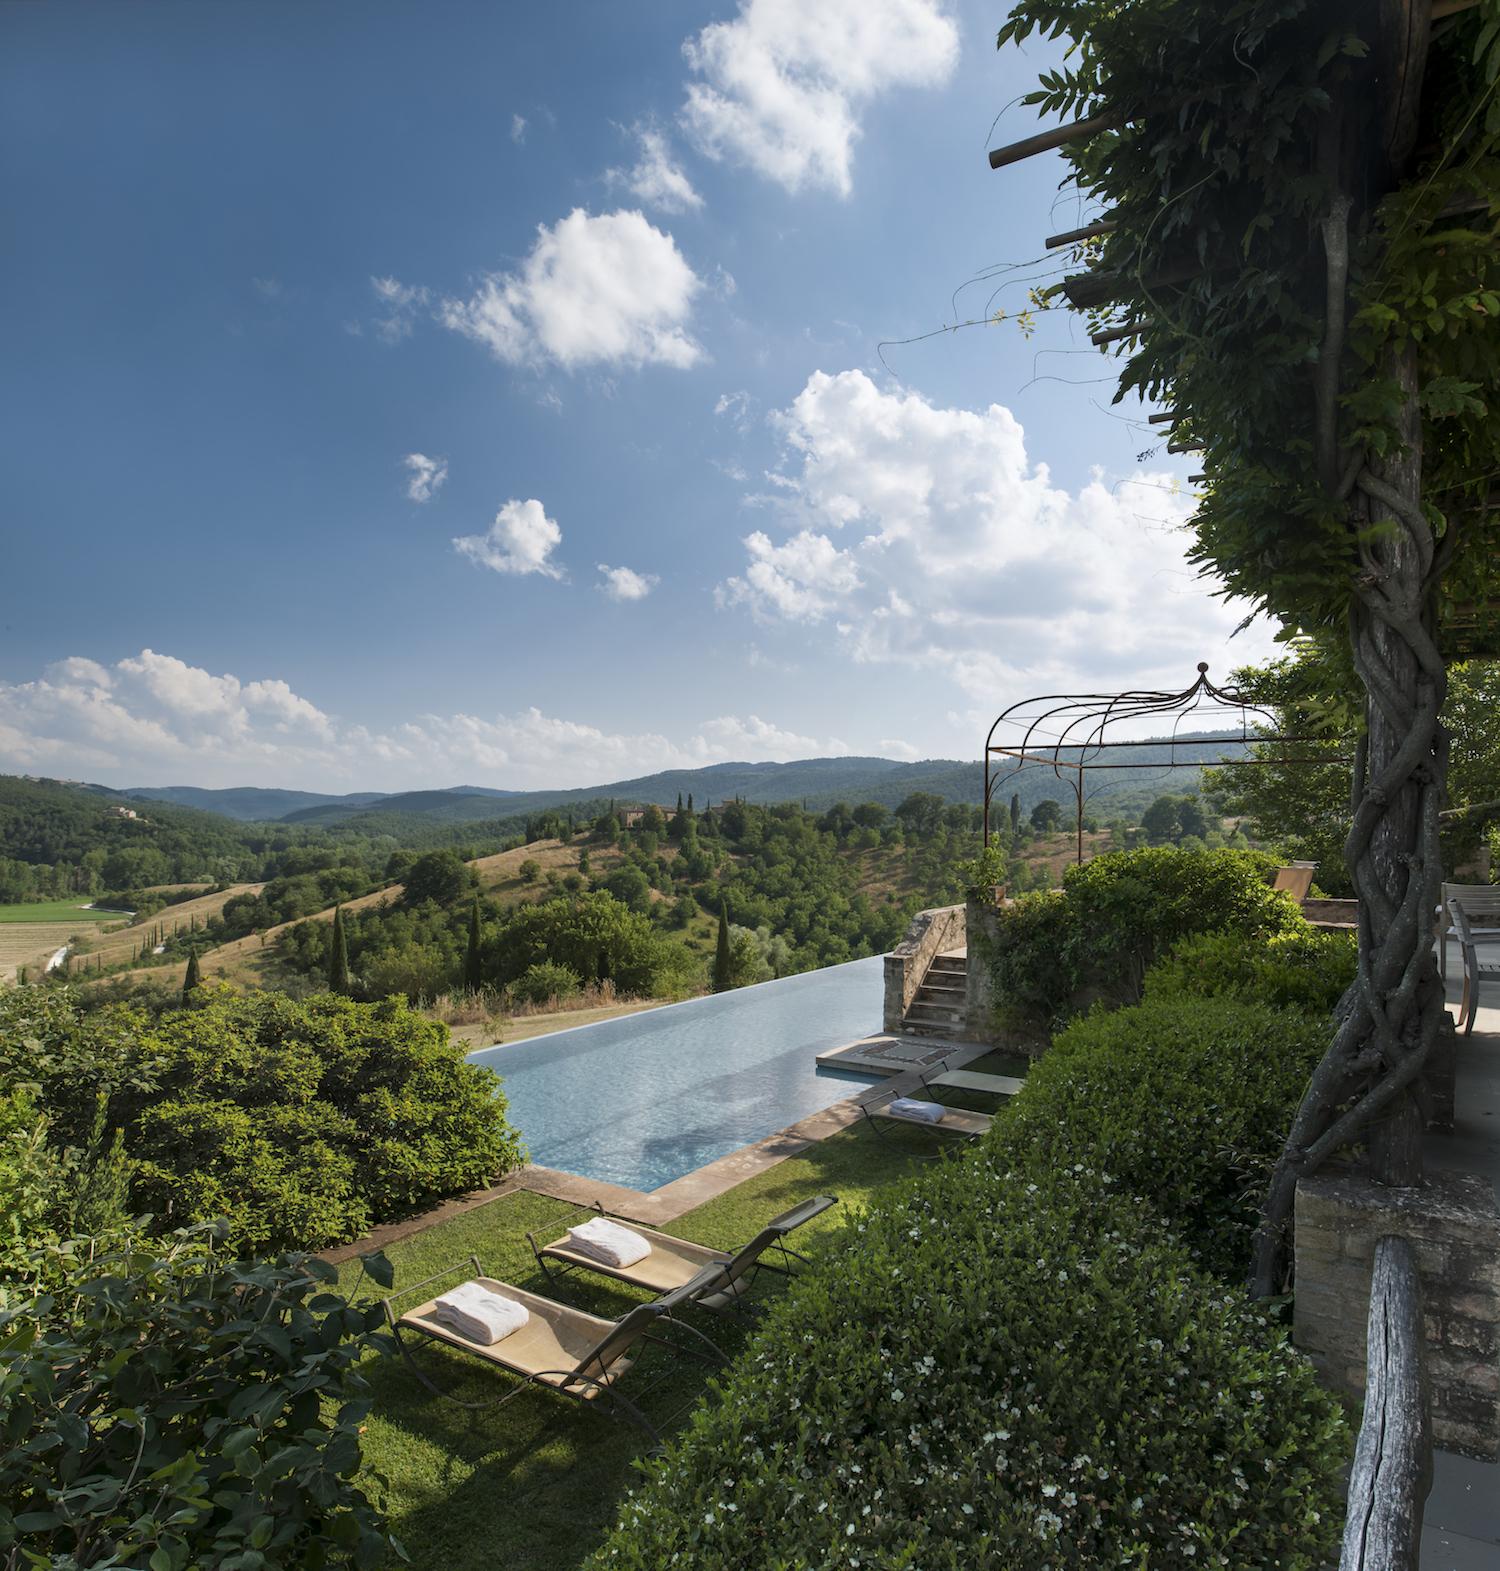 Castello di Reschio - Barco 37 .jpg